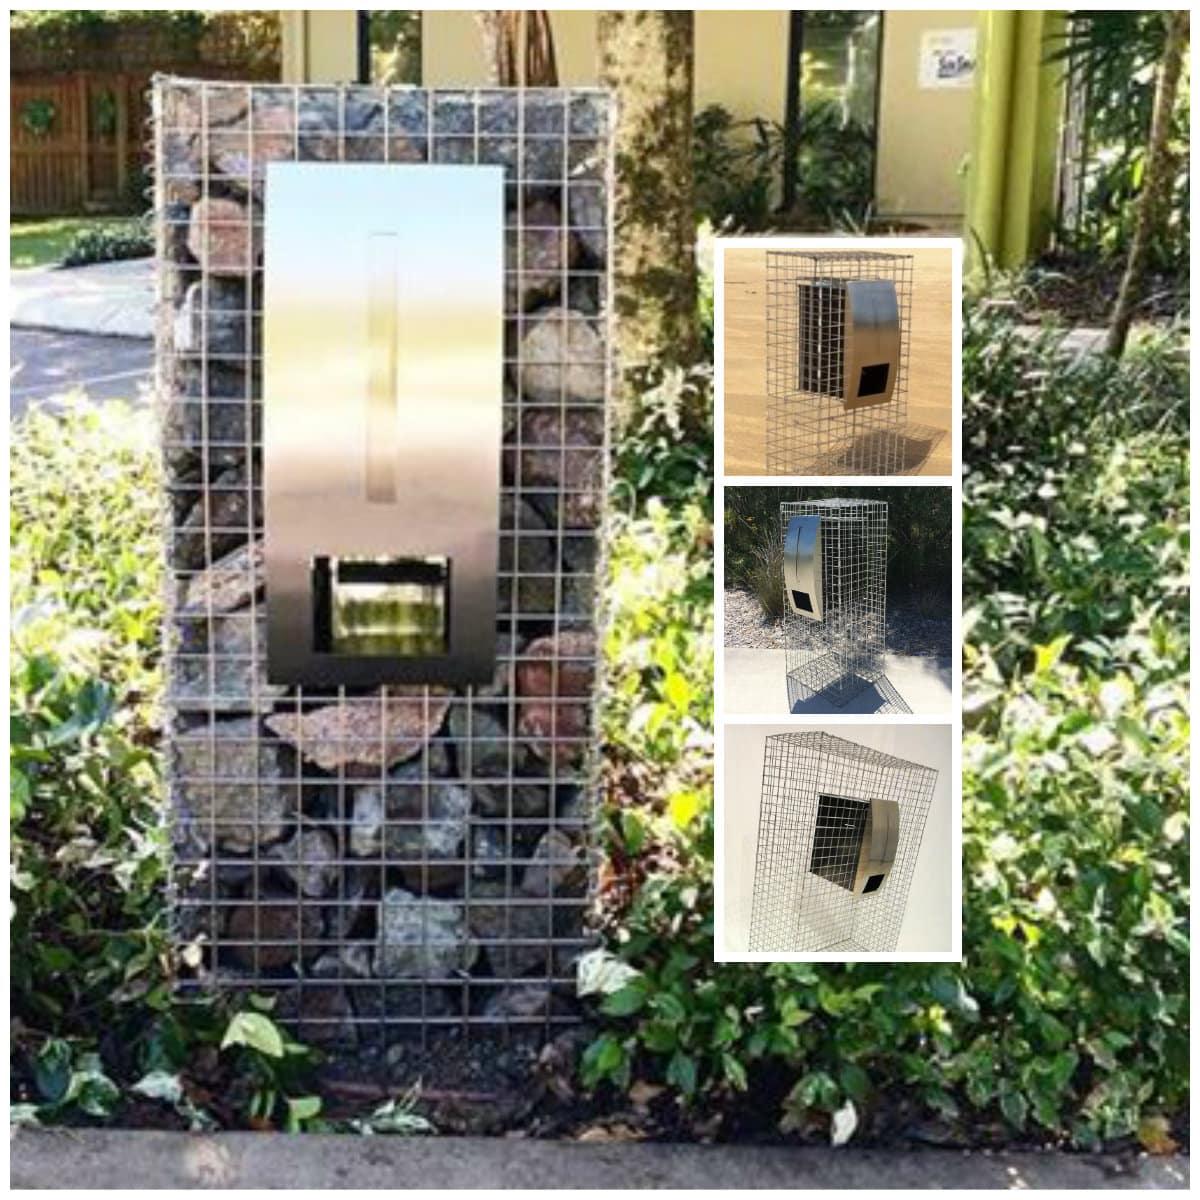 gabion cages, urban kubez, gabion basket, gabion rock, gabion retaining wall, gabion feature, gabion letterbox, gabion baskets queensland